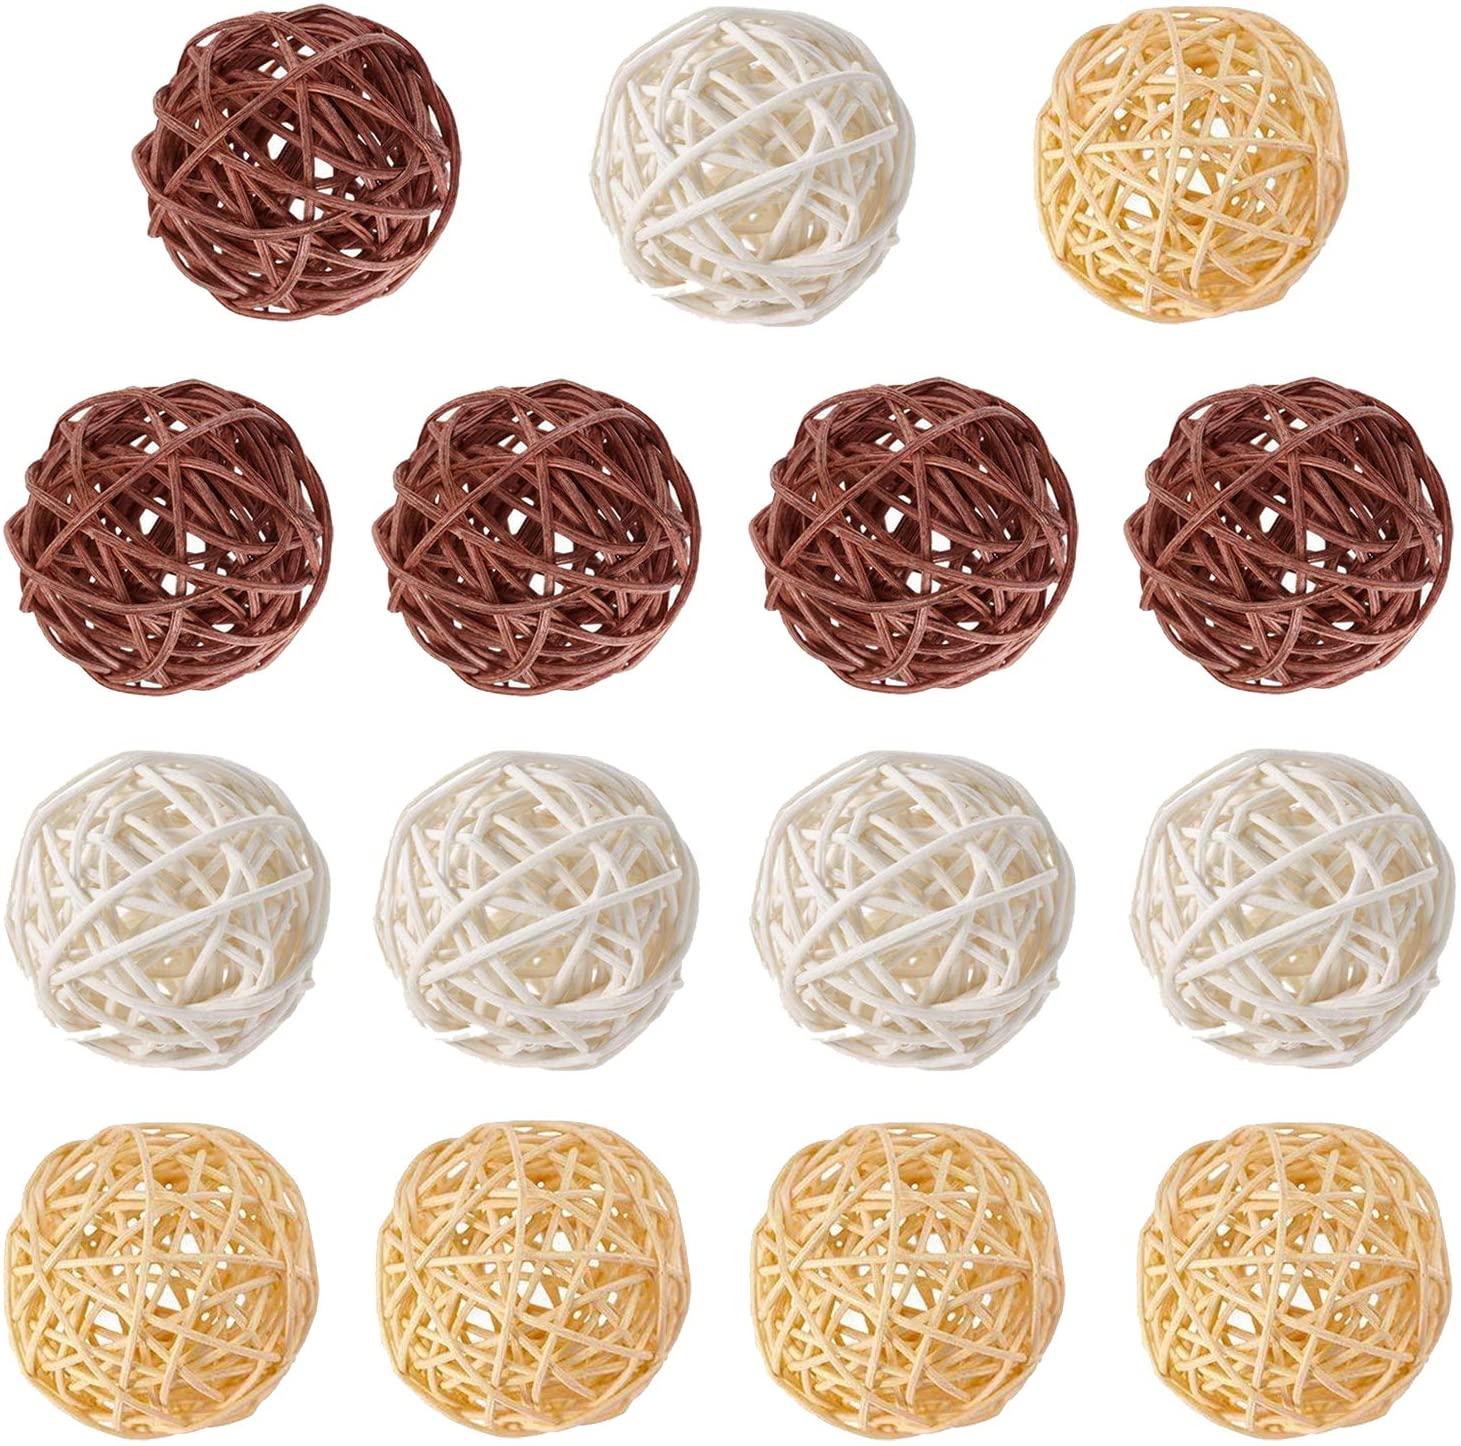 Worldoor 15pcs Mixed White Beige and CoffeeWicker Rattan Balls Decorative Orbs Spherical Natural Woven Vase Filler, Balls Spheres Orbs Filler